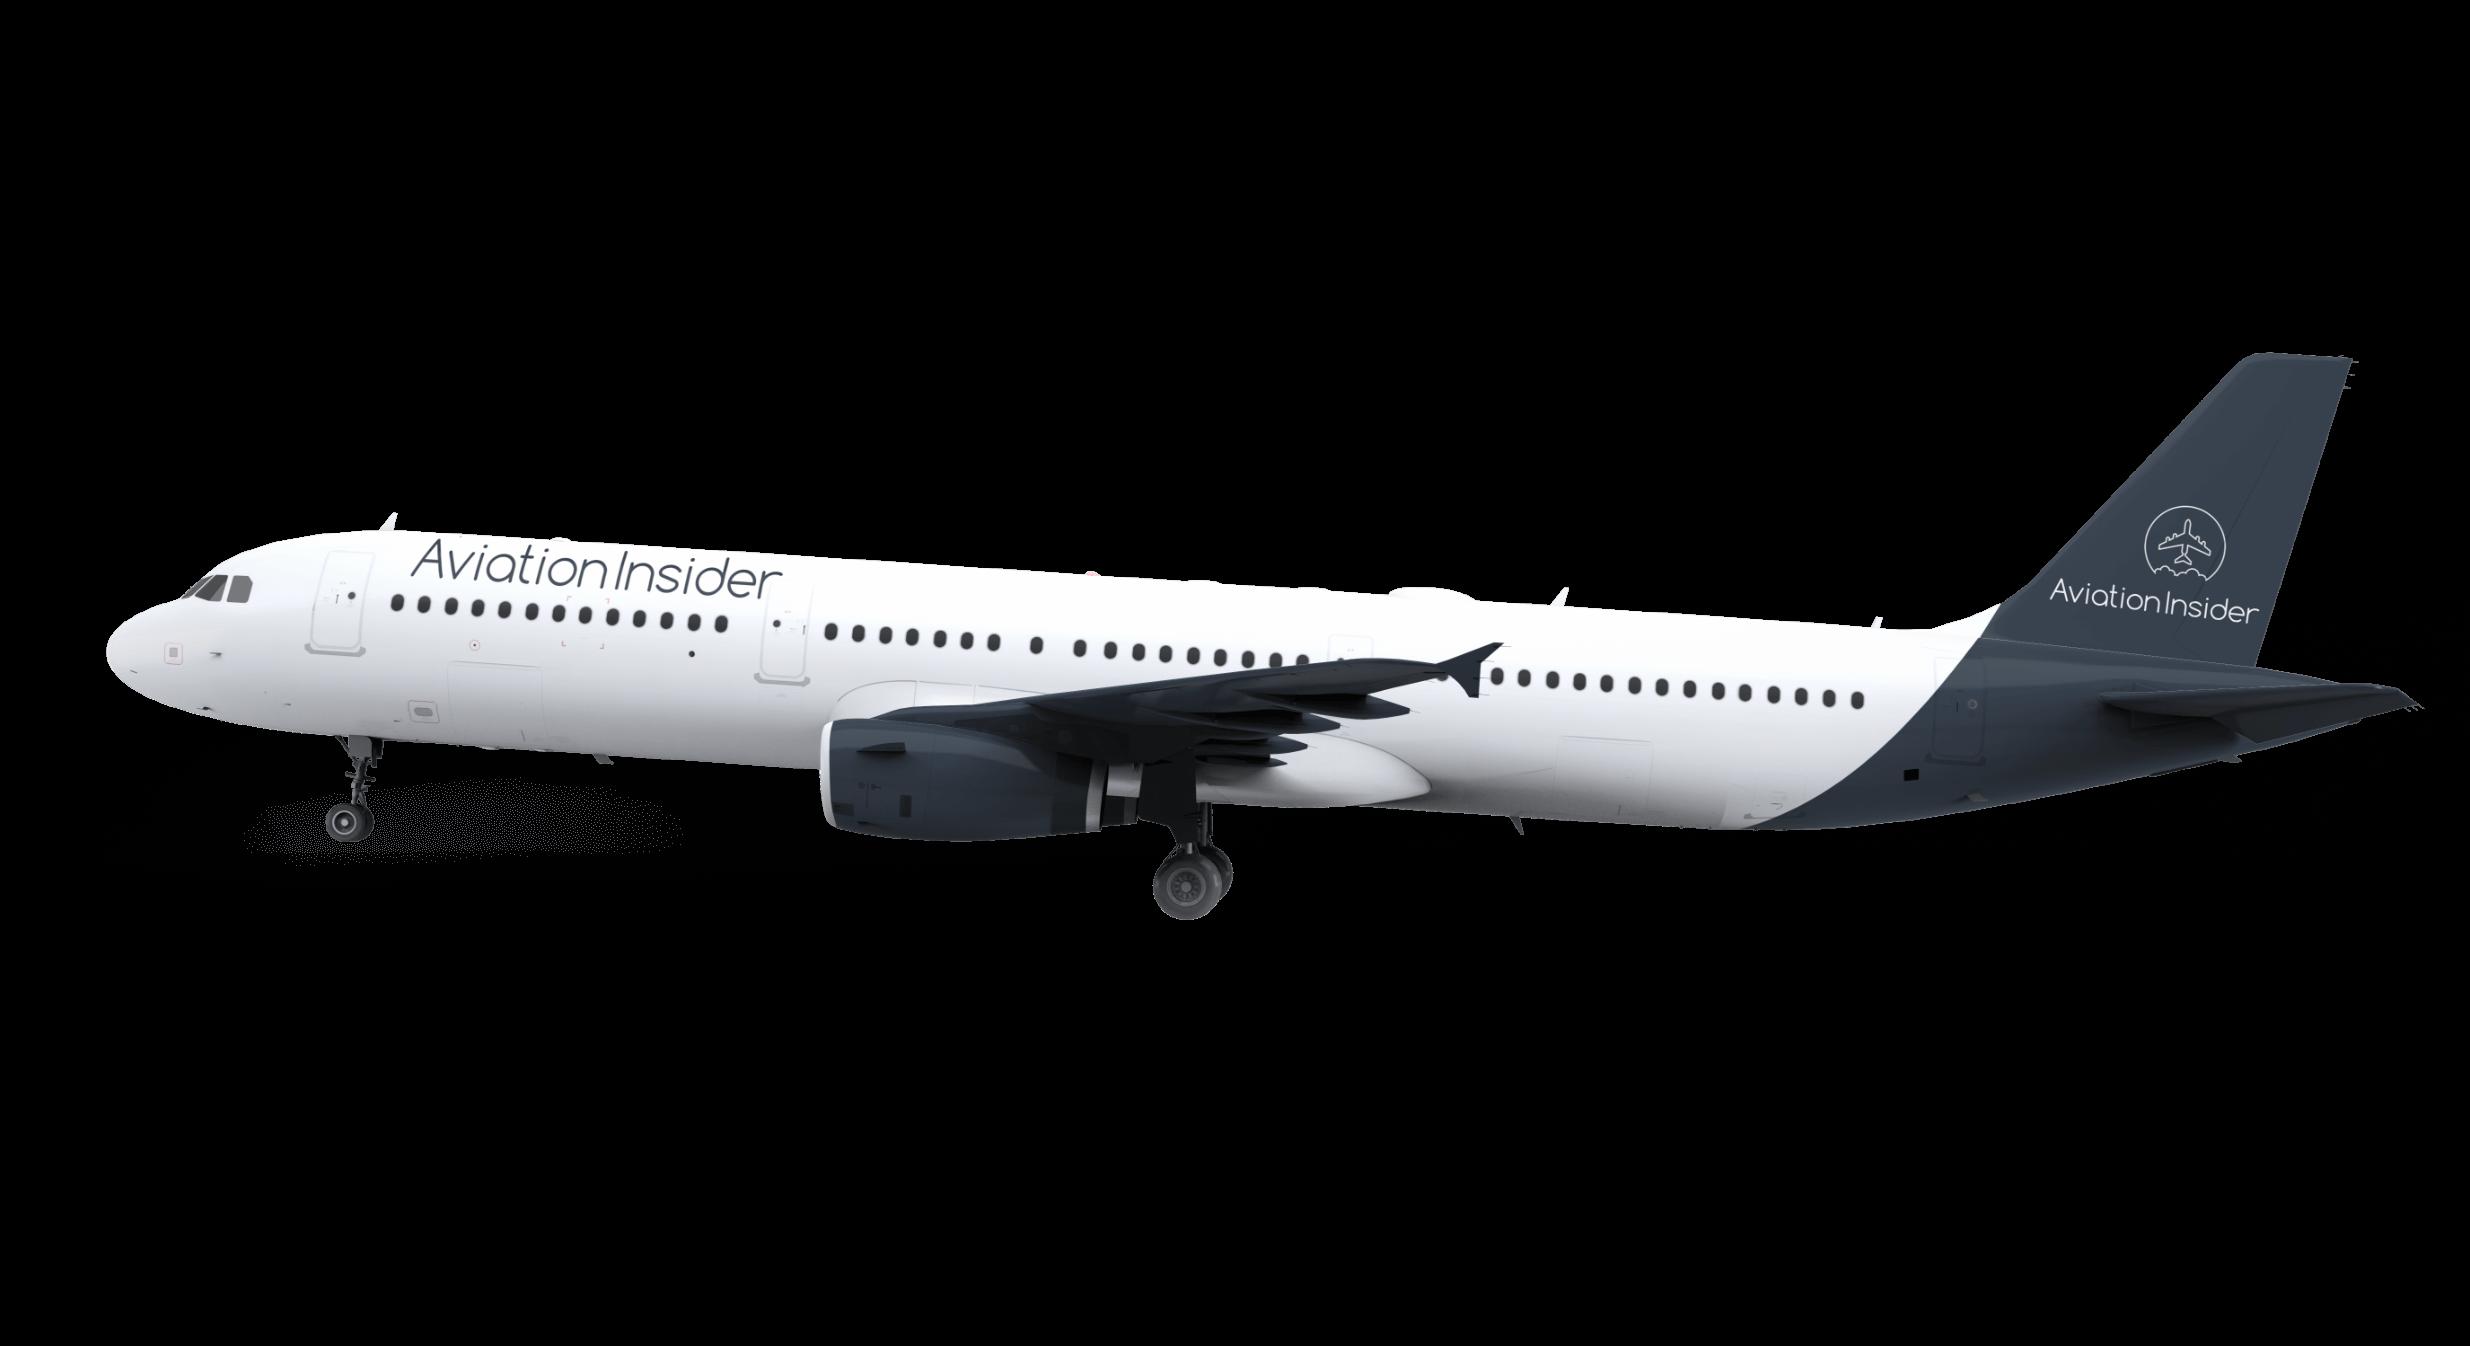 Aviation Insider airline pilot training